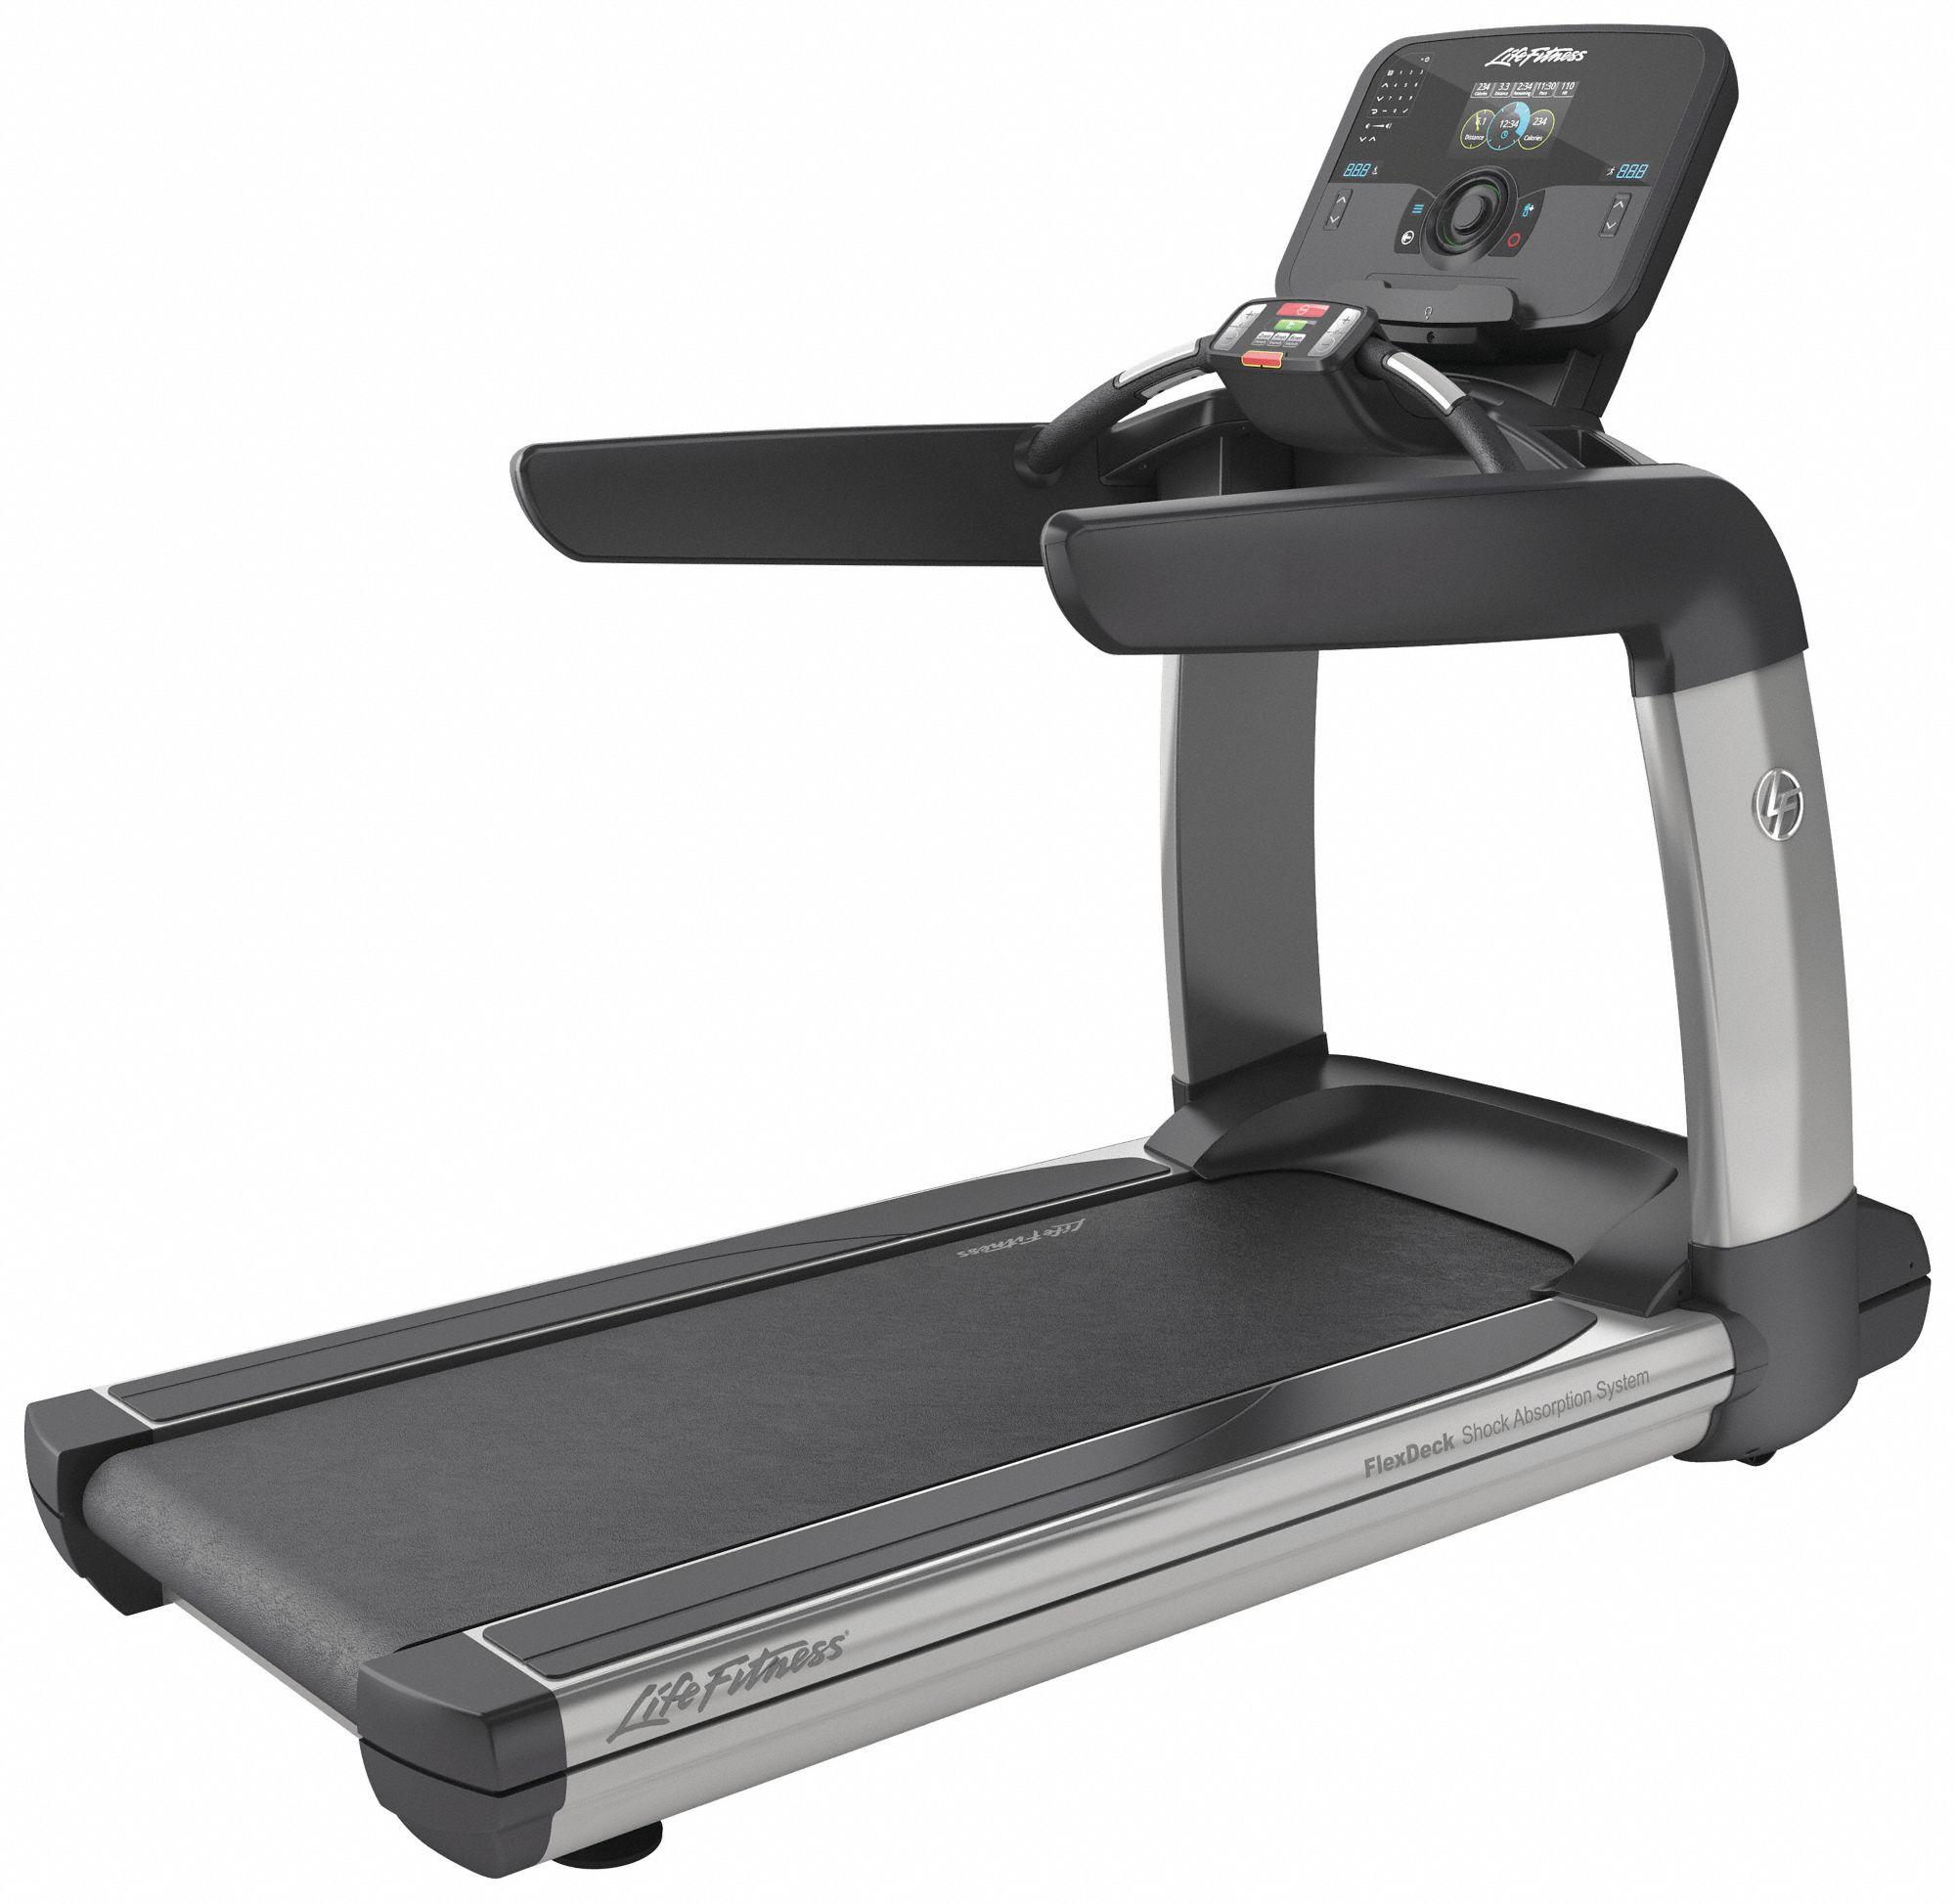 Life Fitness Treadmill History: LIFE FITNESS Treadmill, Buil In Digital Monitor